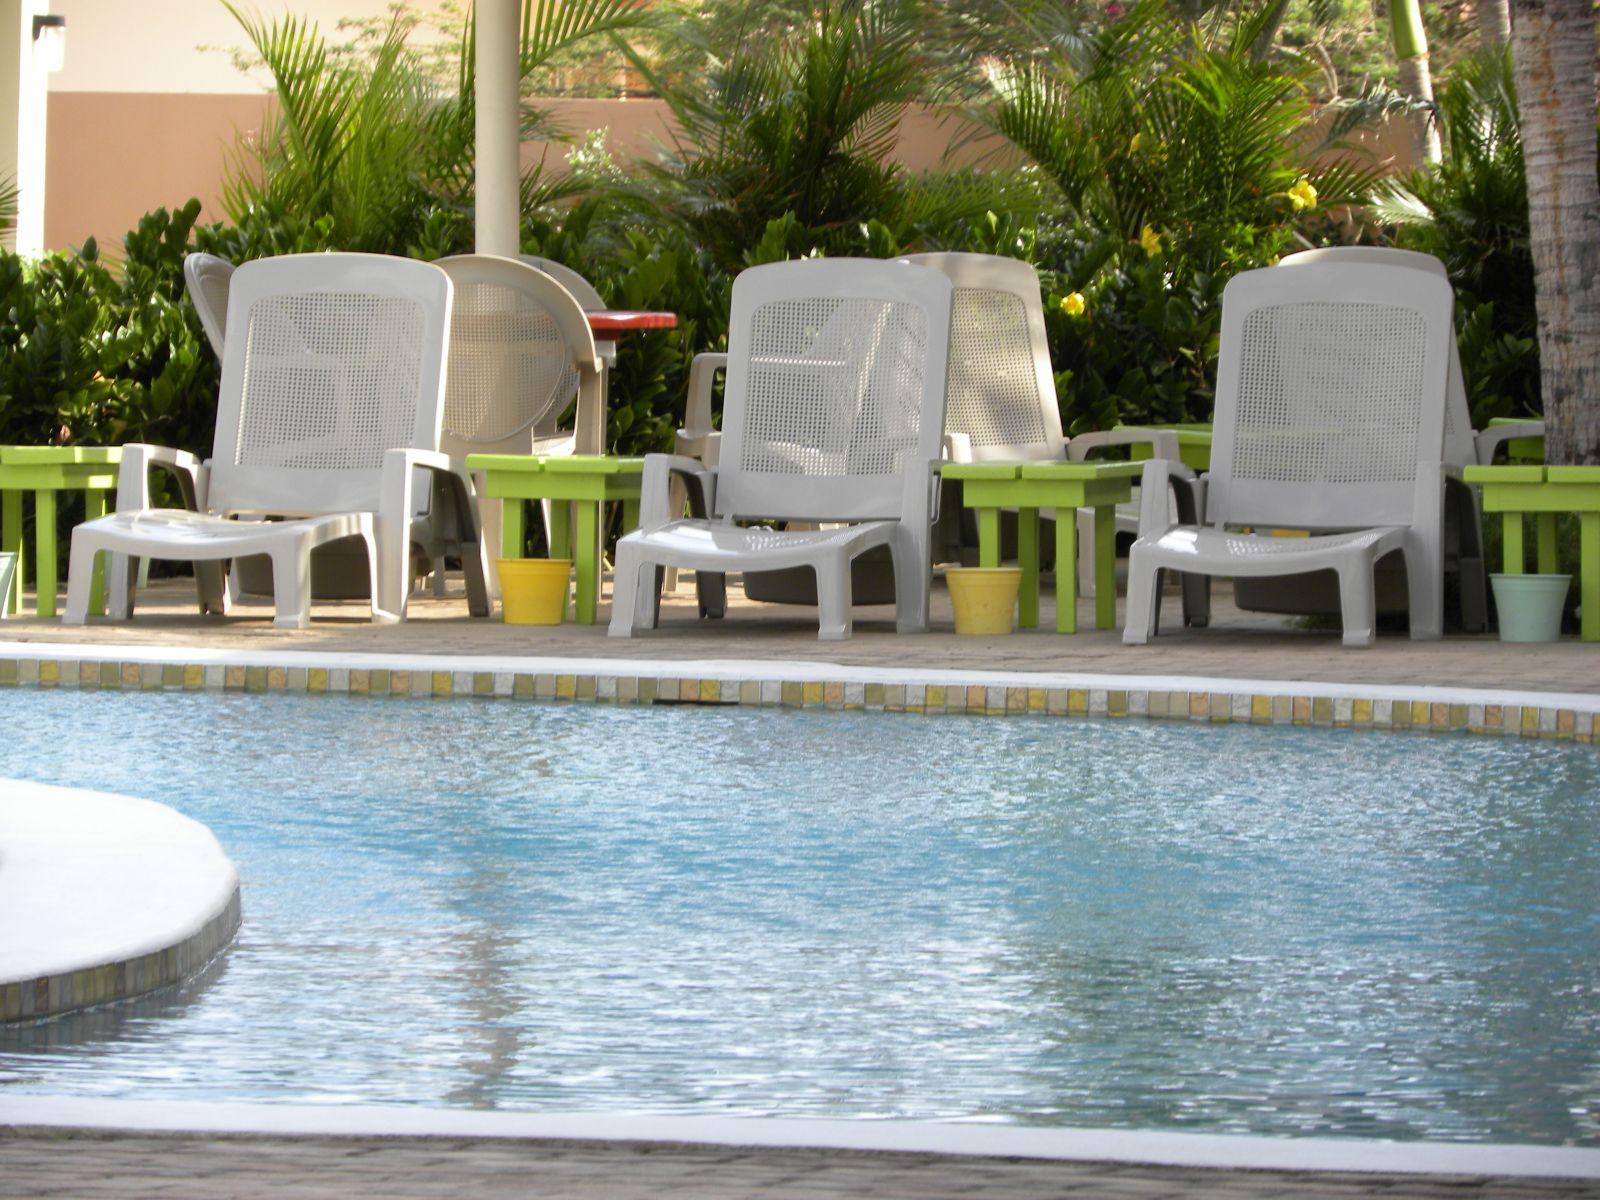 Quality Appartments Aruba 28 Images Loft Apartments